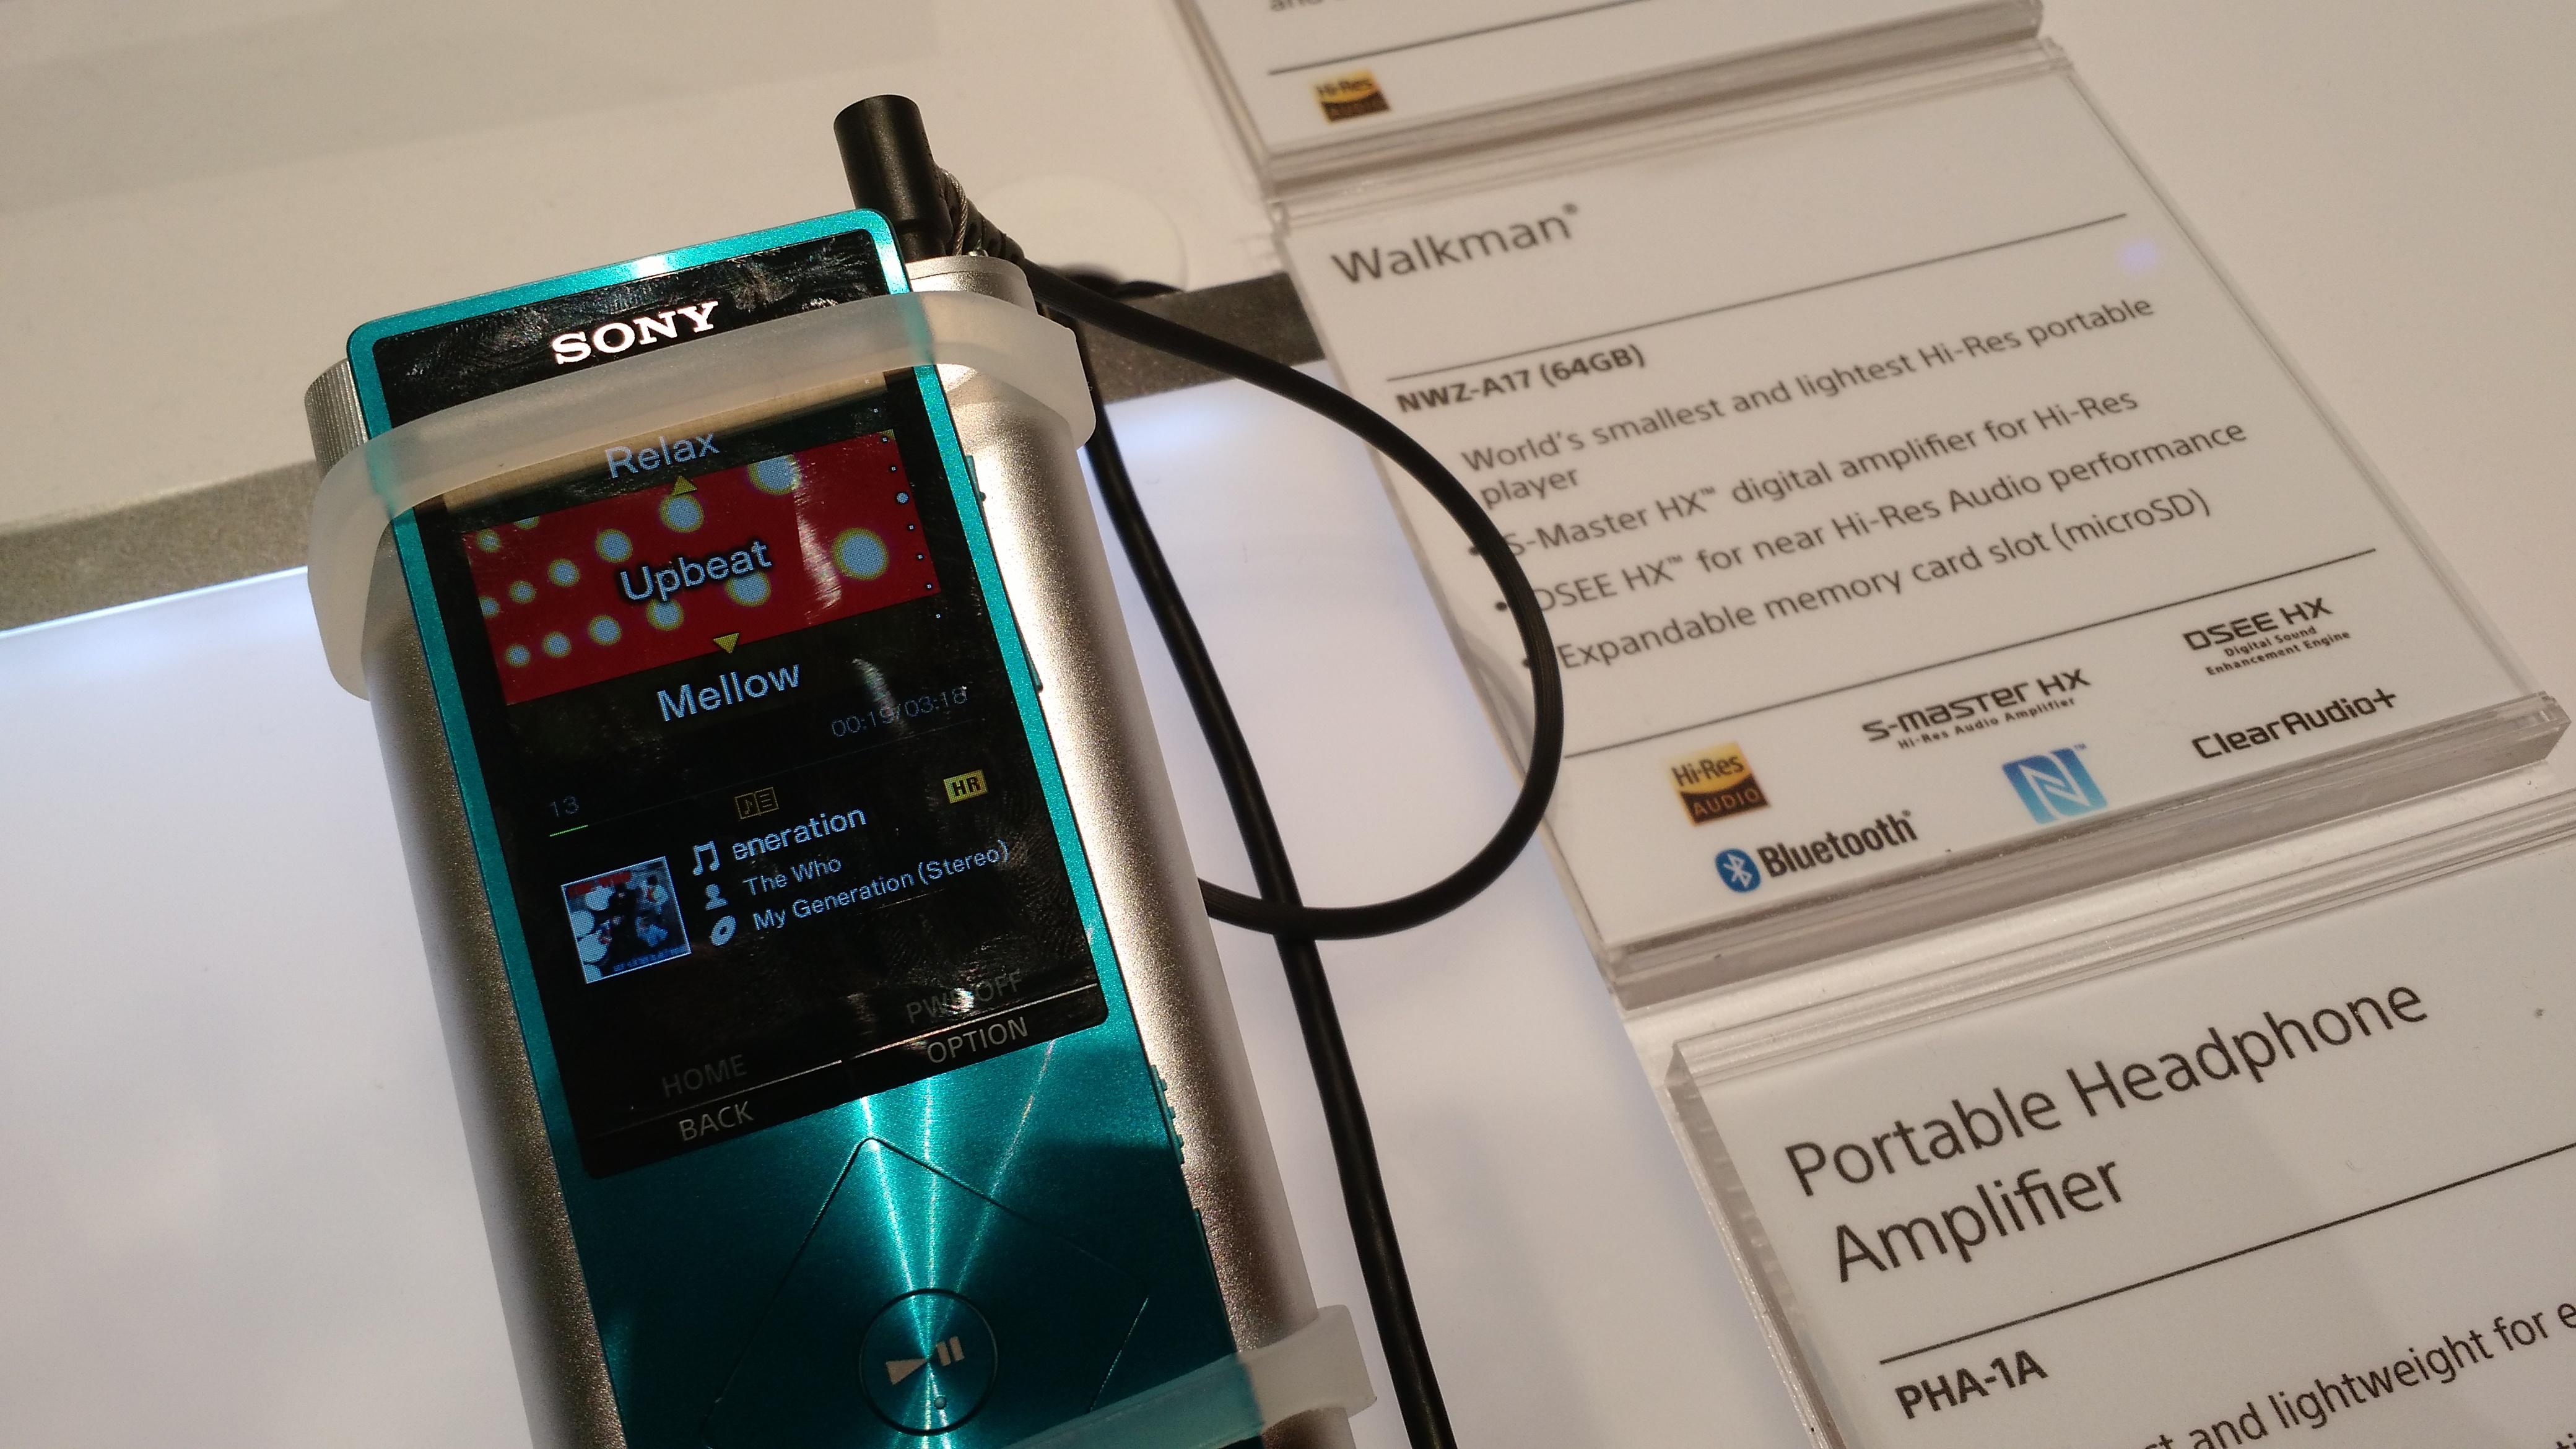 Sony Walkman A17 at CES 2015